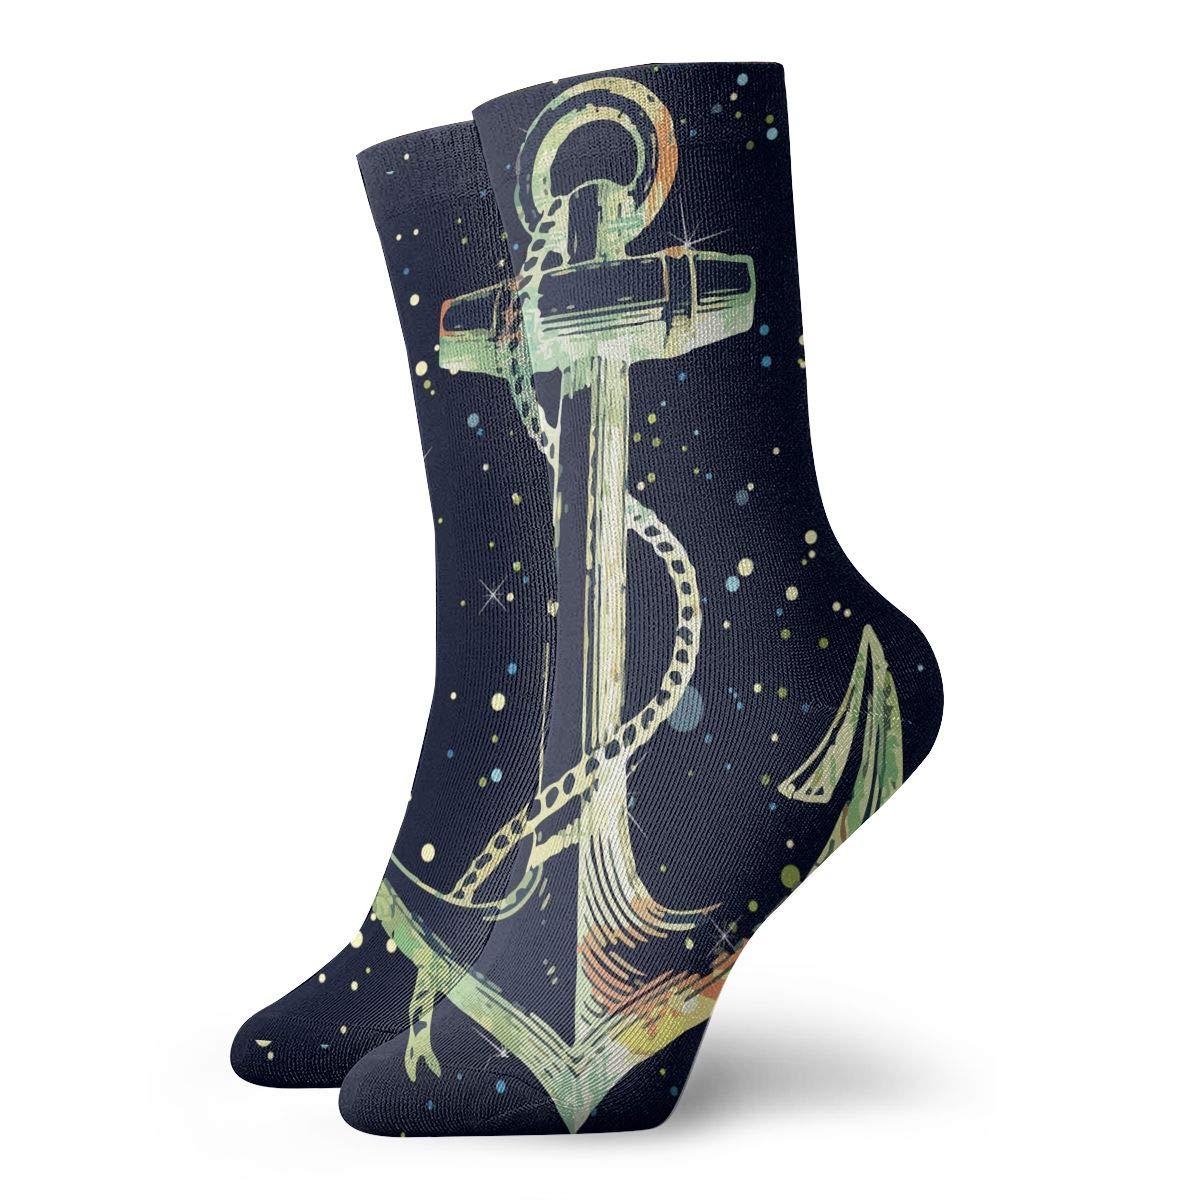 Anchor Fashion Dress Socks Short Socks Leisure Travel 11.8 Inch